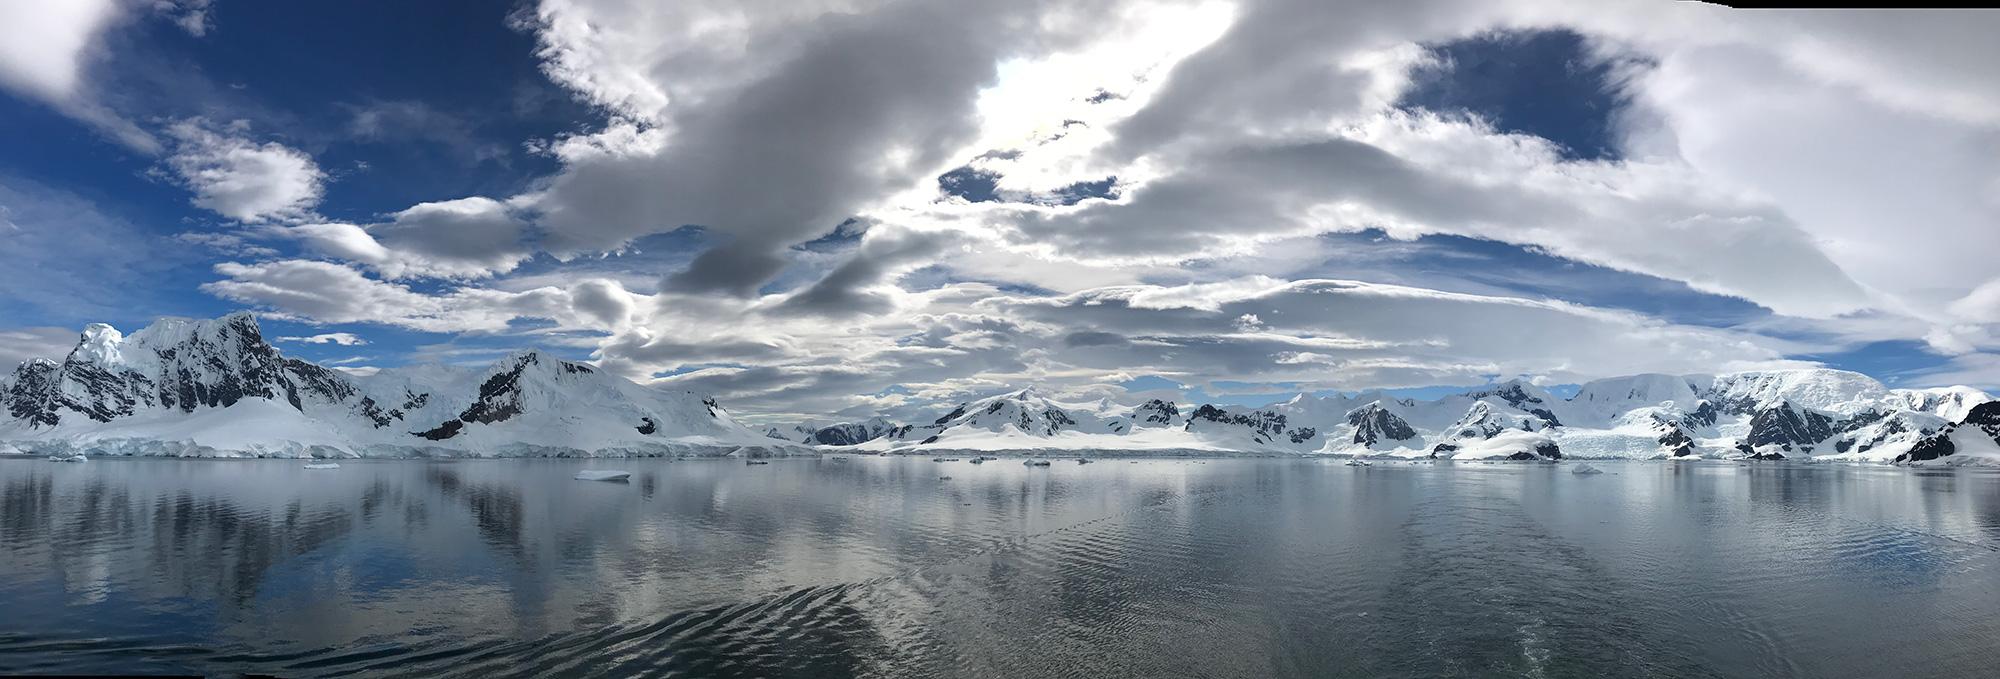 Paradise Harbour, Gerlache Strait, Antarctica.